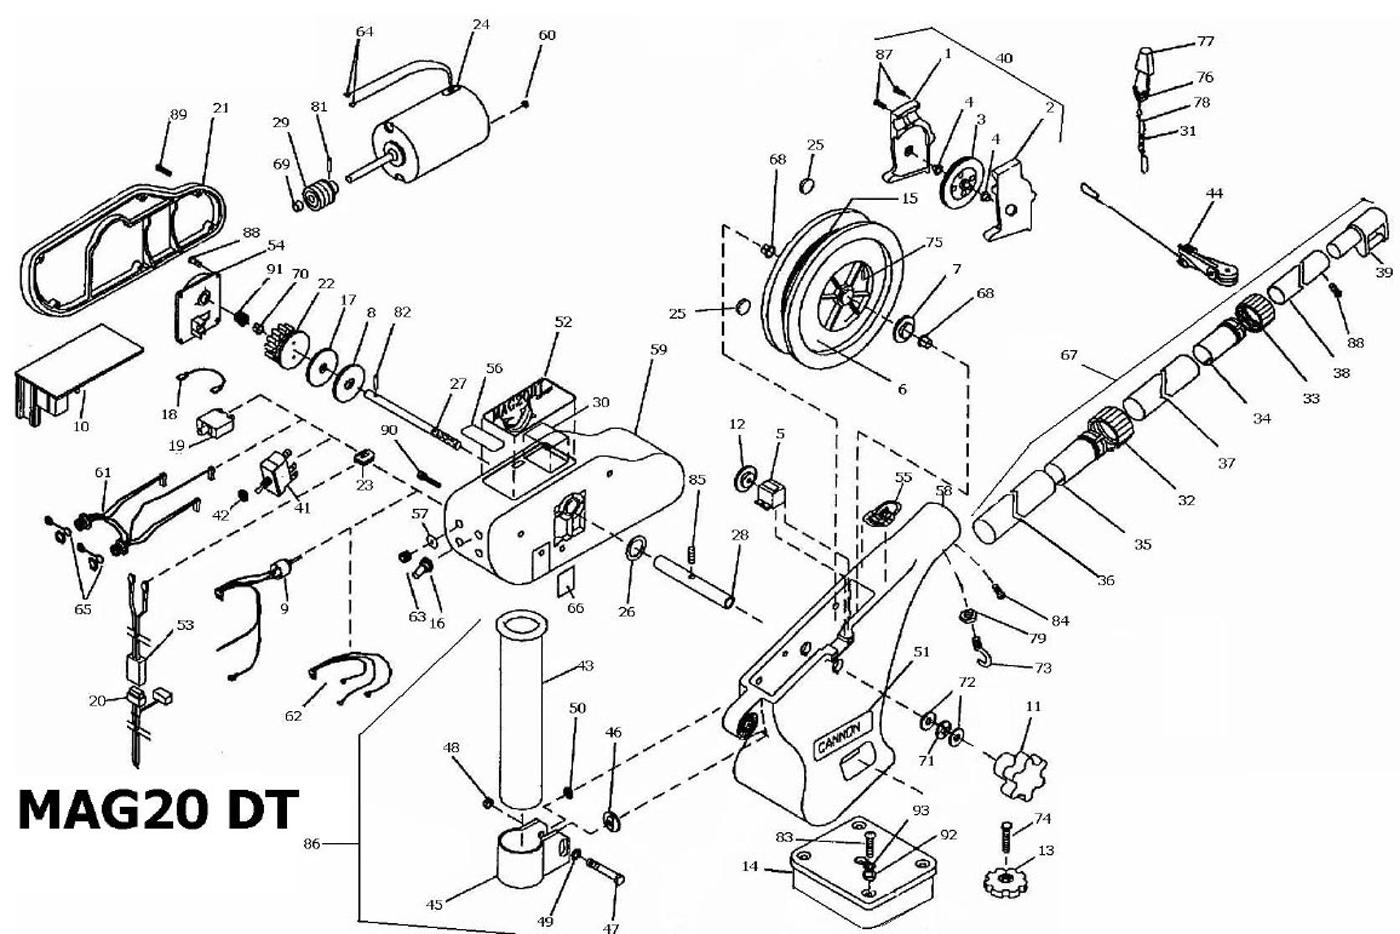 crankshaft sensor wire diagram for 2001 honda civic dx